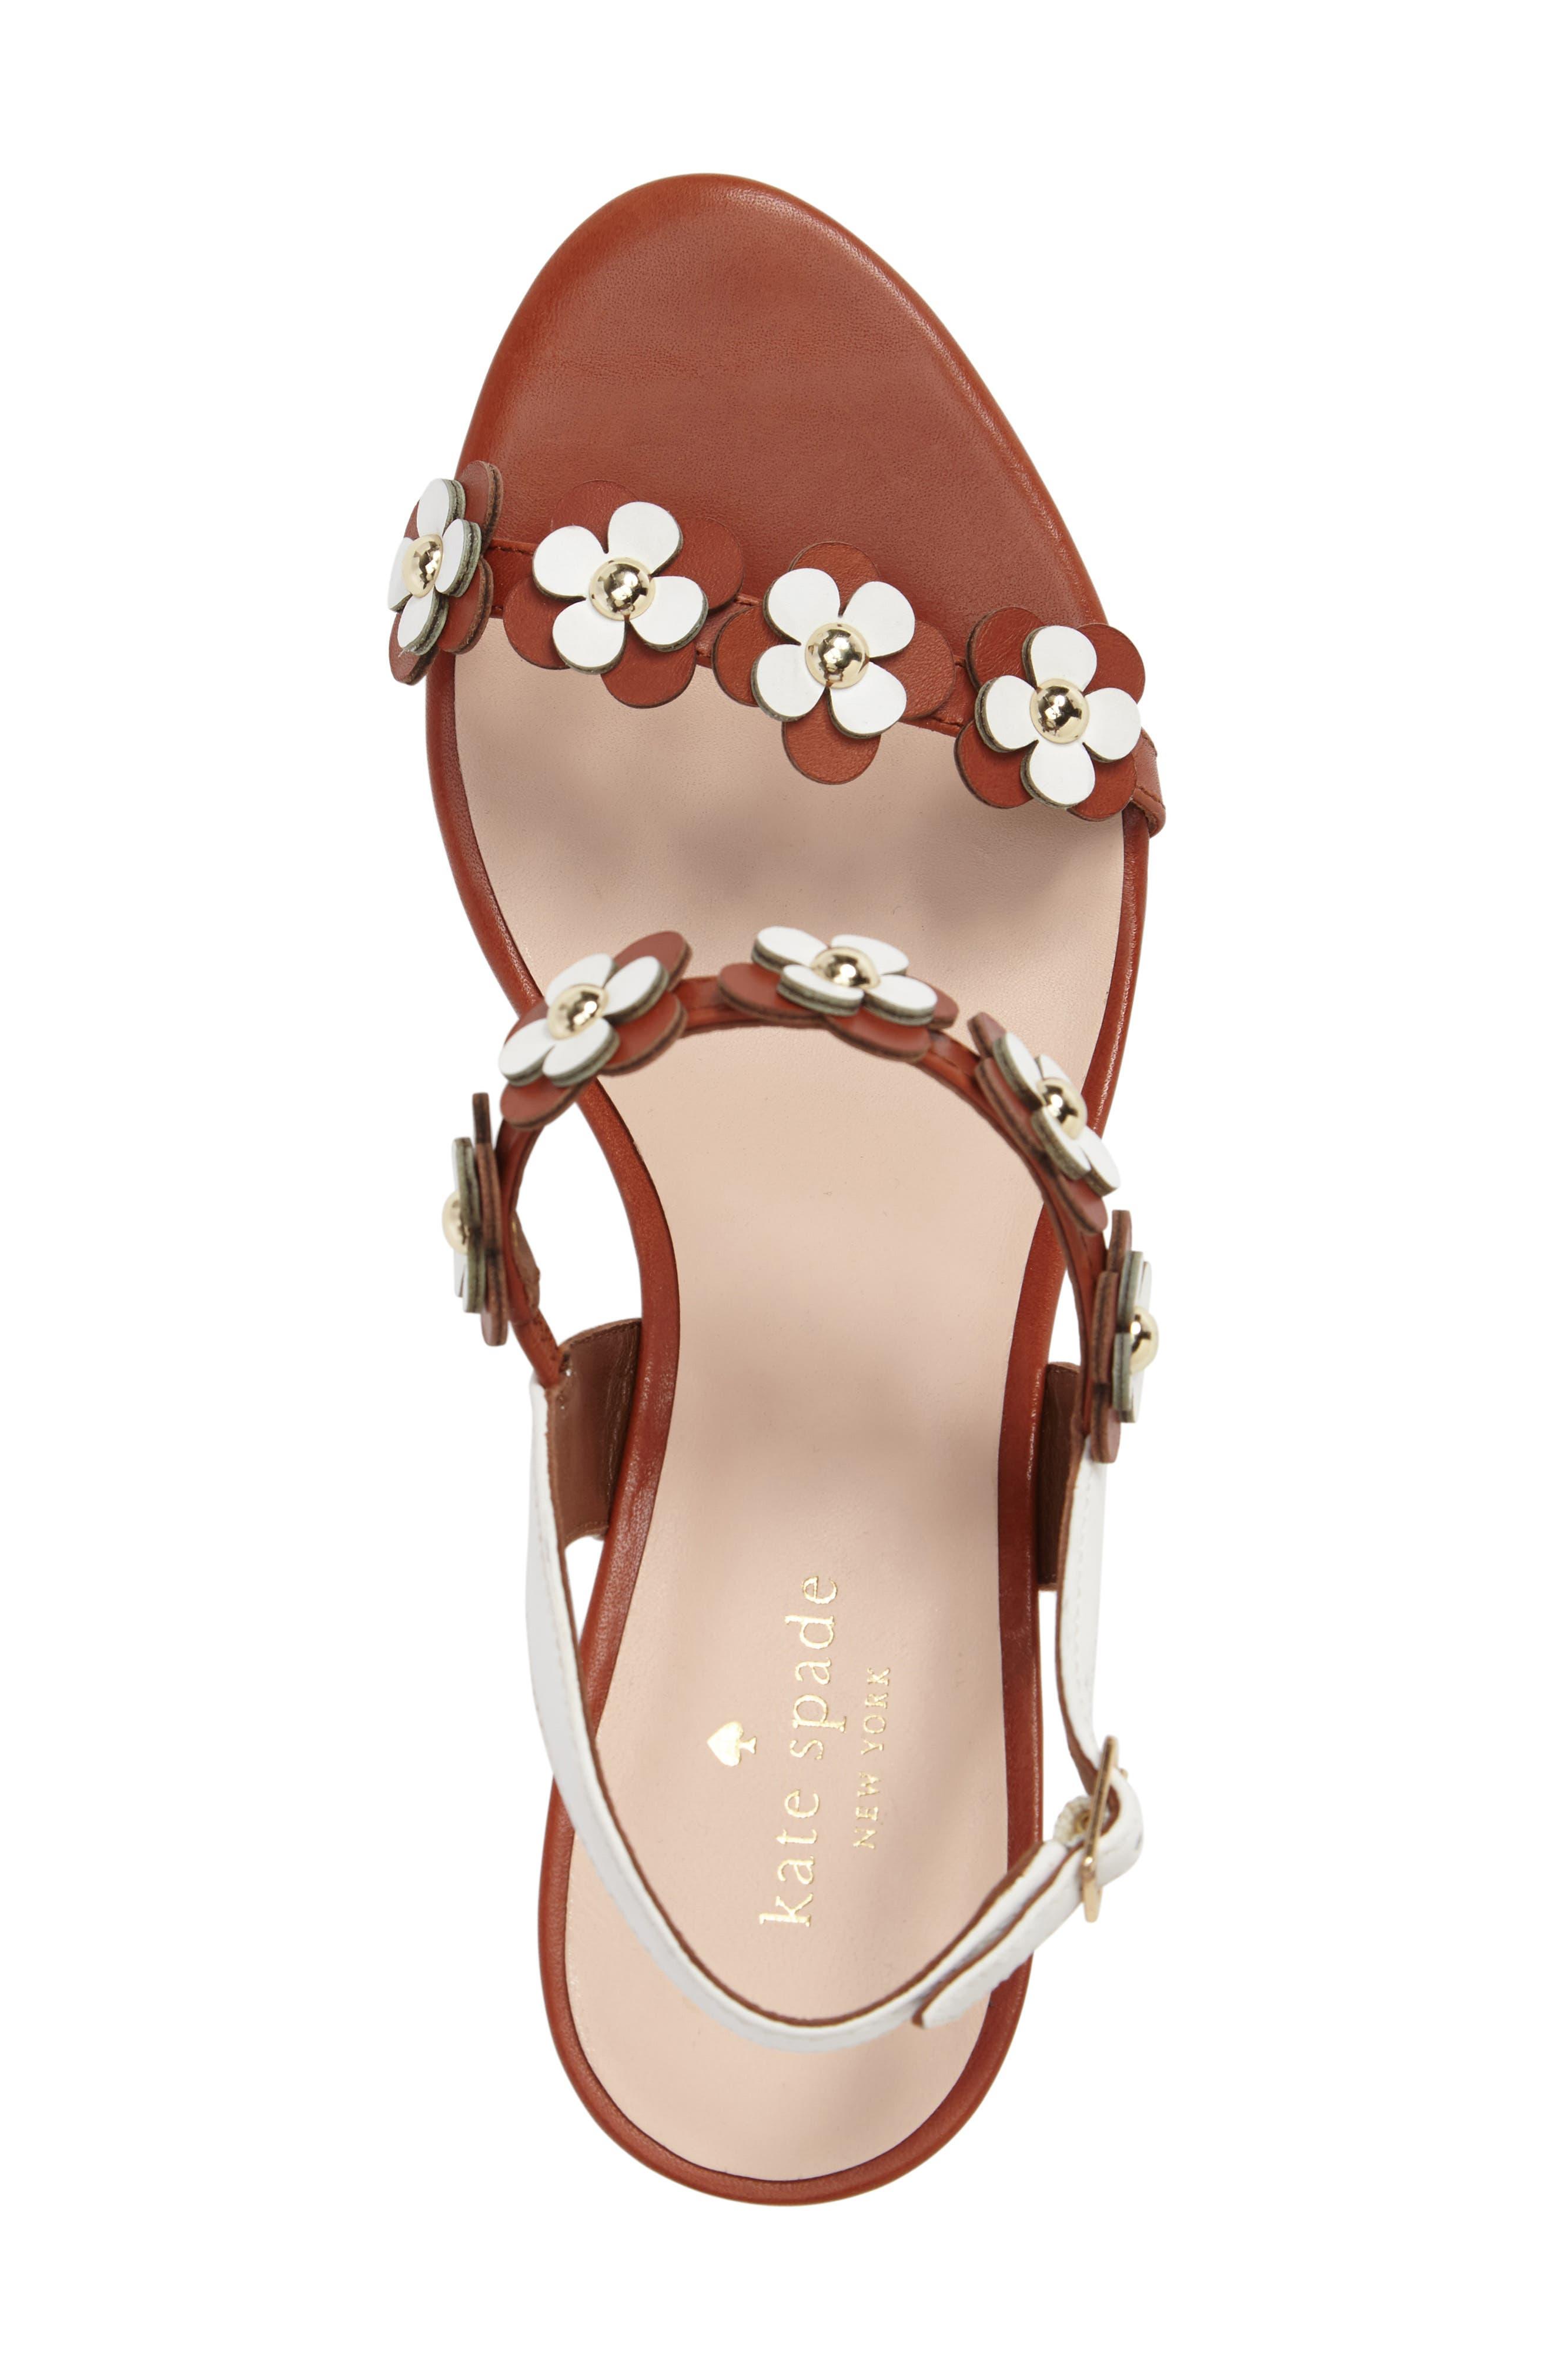 KATE SPADE NEW YORK, tisdale platform wedge sandal, Alternate thumbnail 5, color, 200